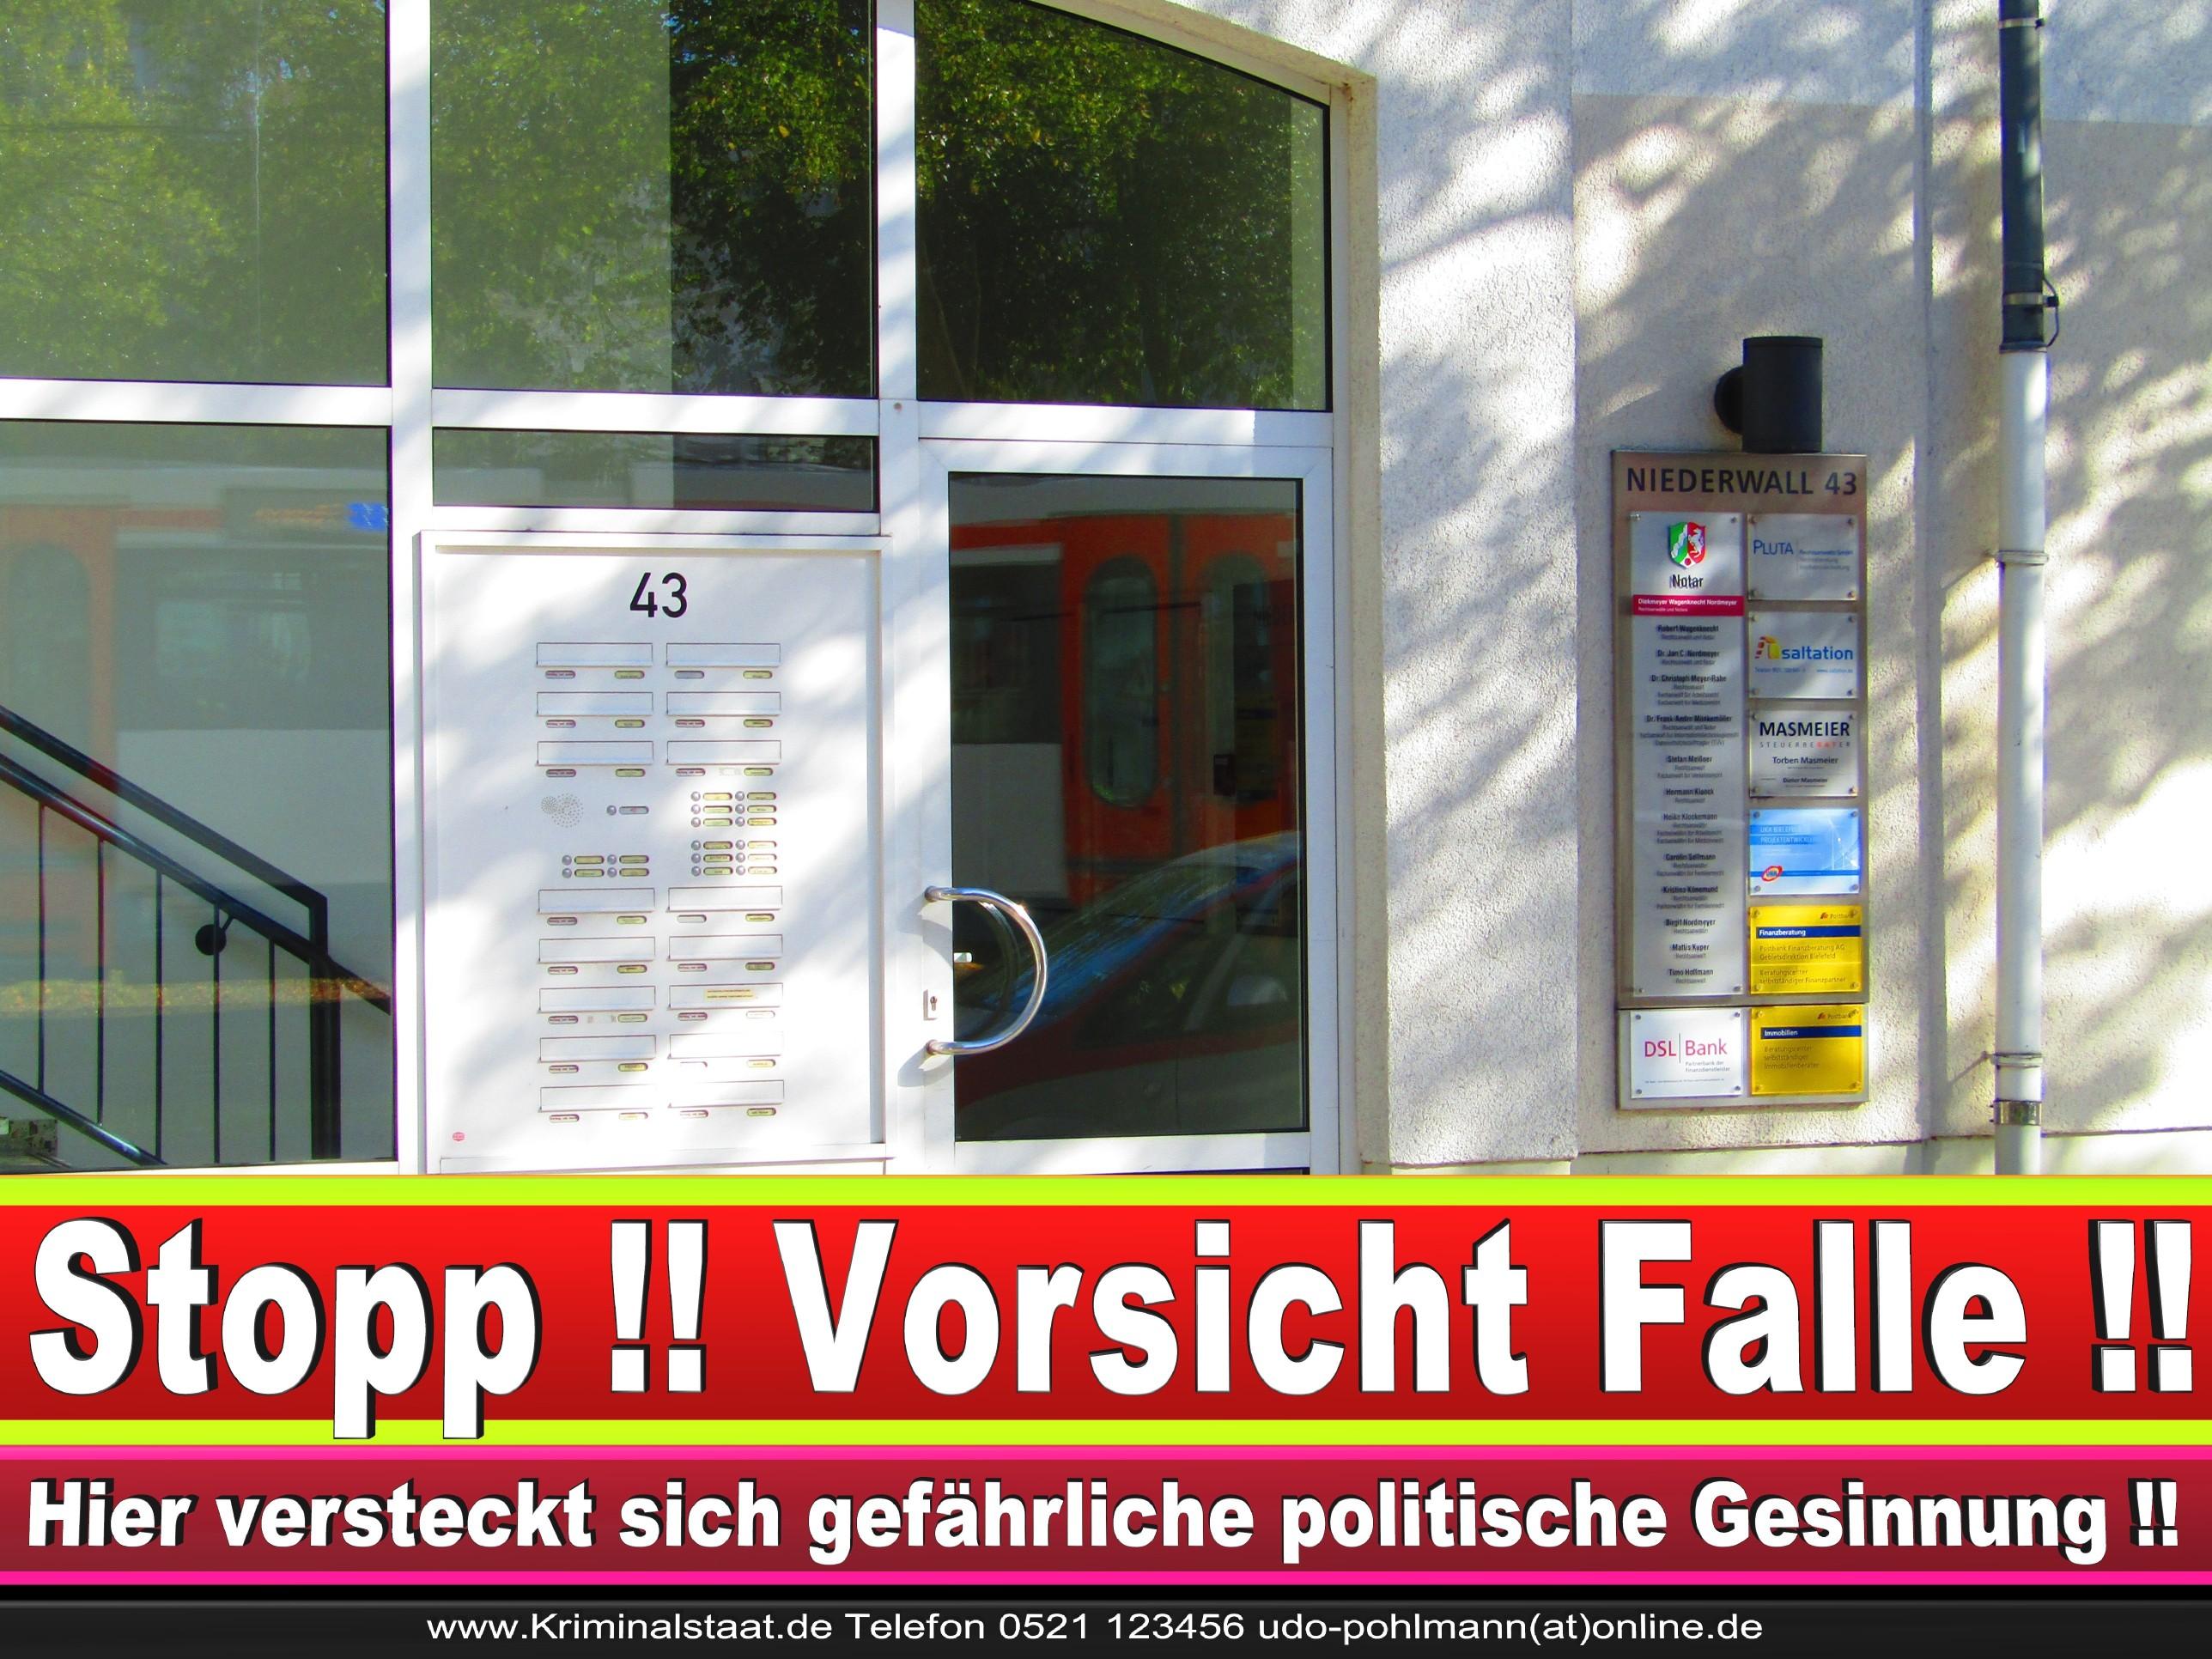 Rechtsanwältin Ricarda Osthus Niederwall 43 Bielefeld CDU 7